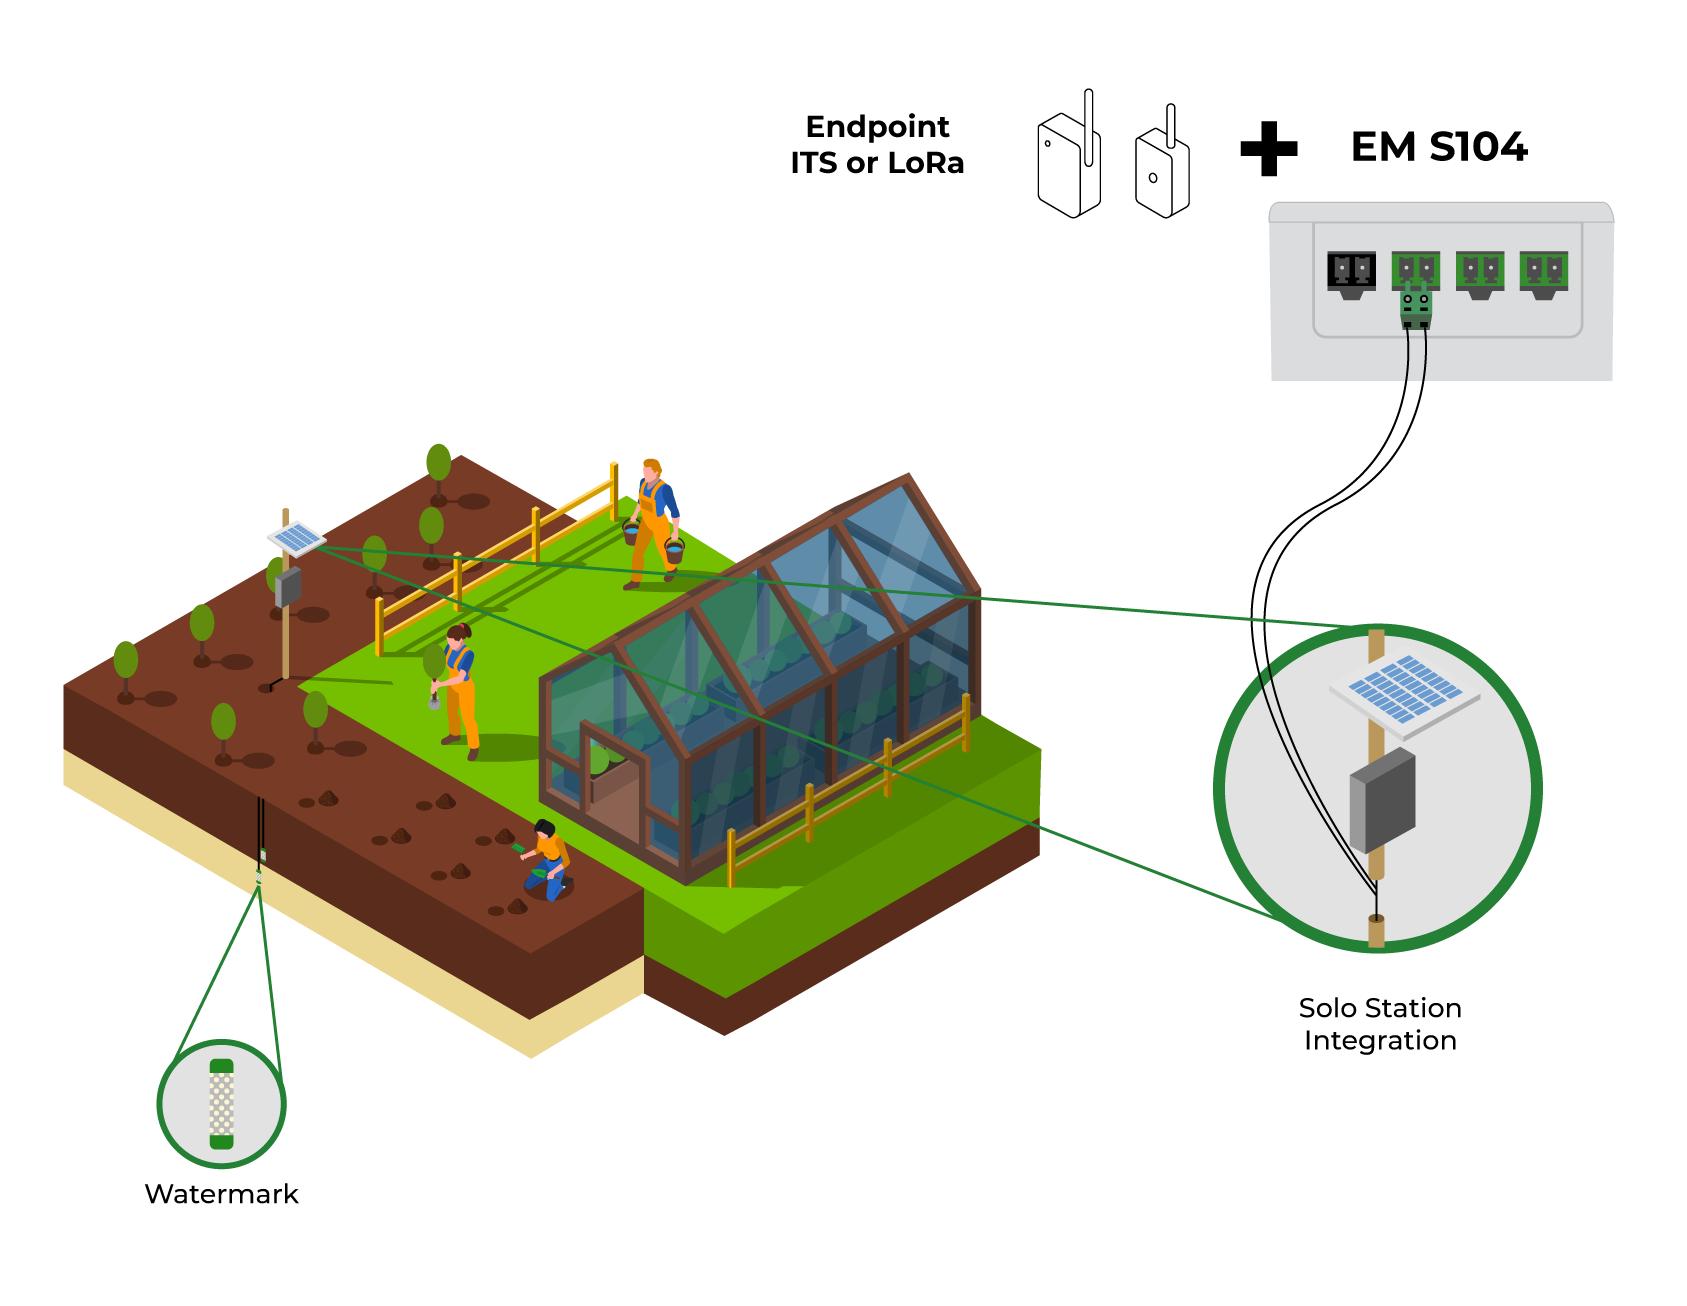 Application model - EM S104 (Khomp IoT Endpoint Extension)